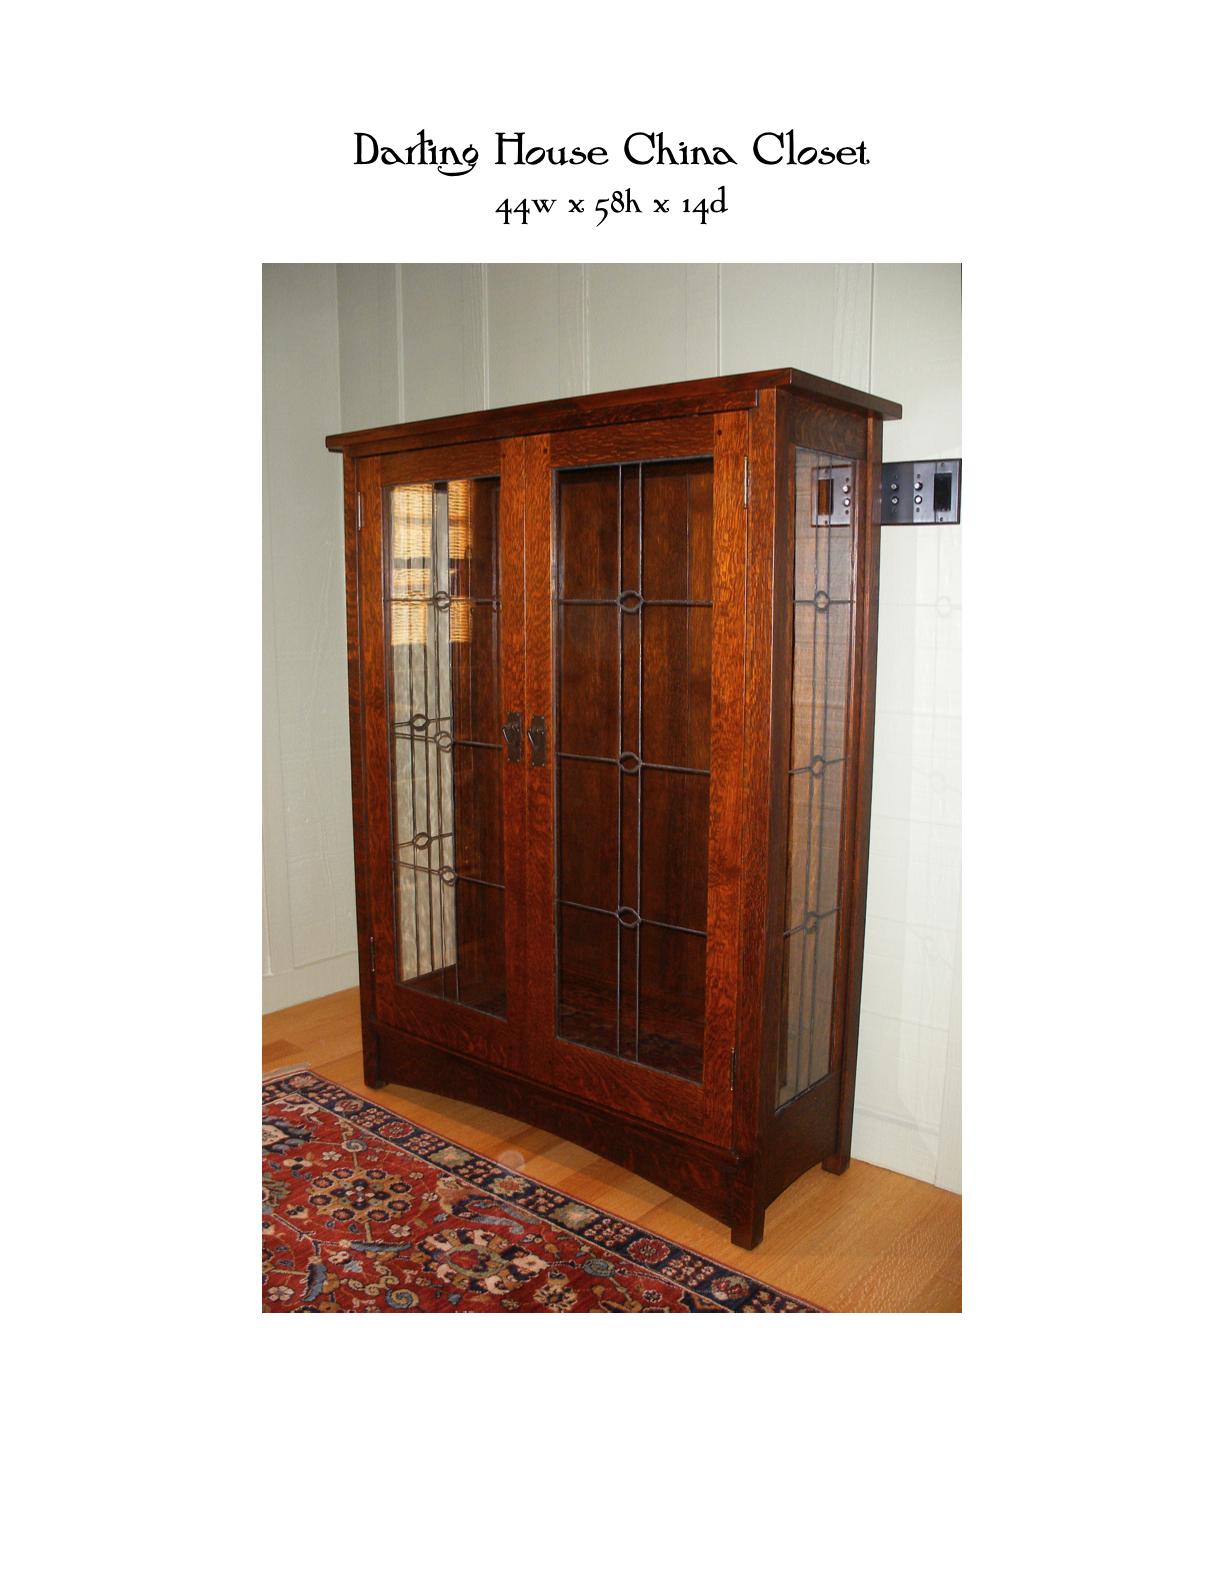 Darling House China Closet Mike Devlin Furniture Design